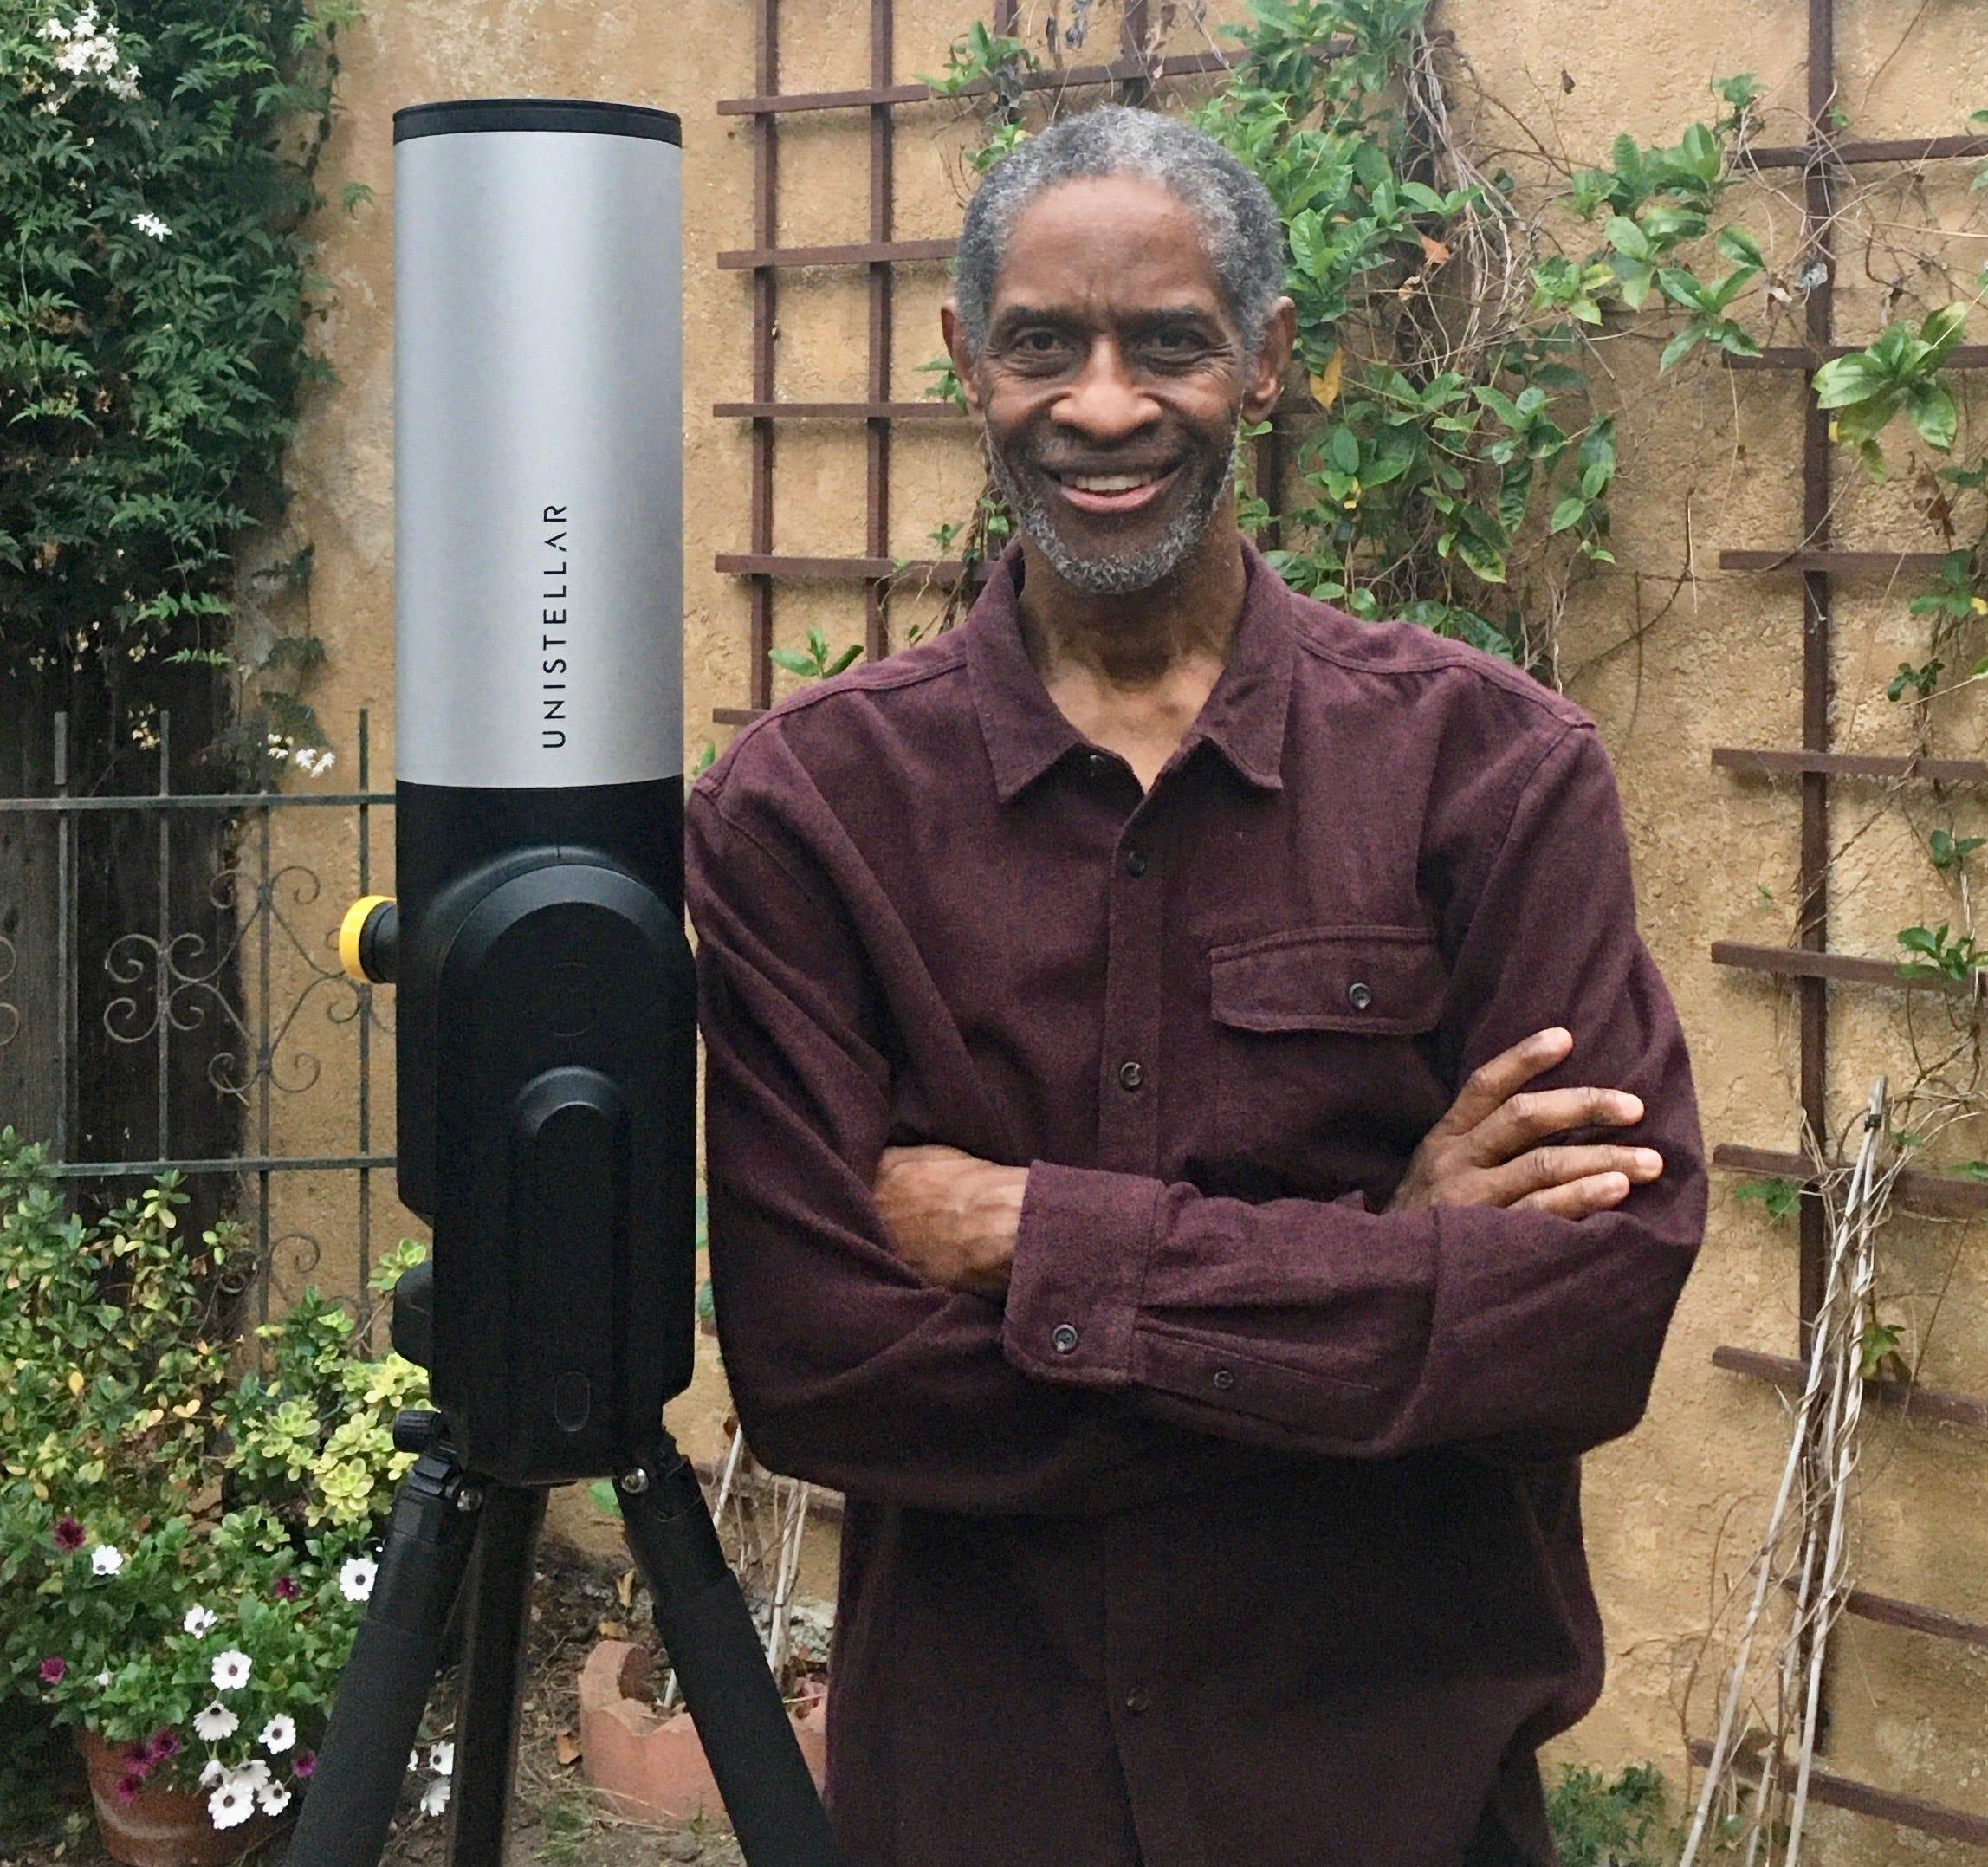 """Star Trek"" Star Tim Russ Helps NASA Detect Asteroid Orbiting Jupiter"